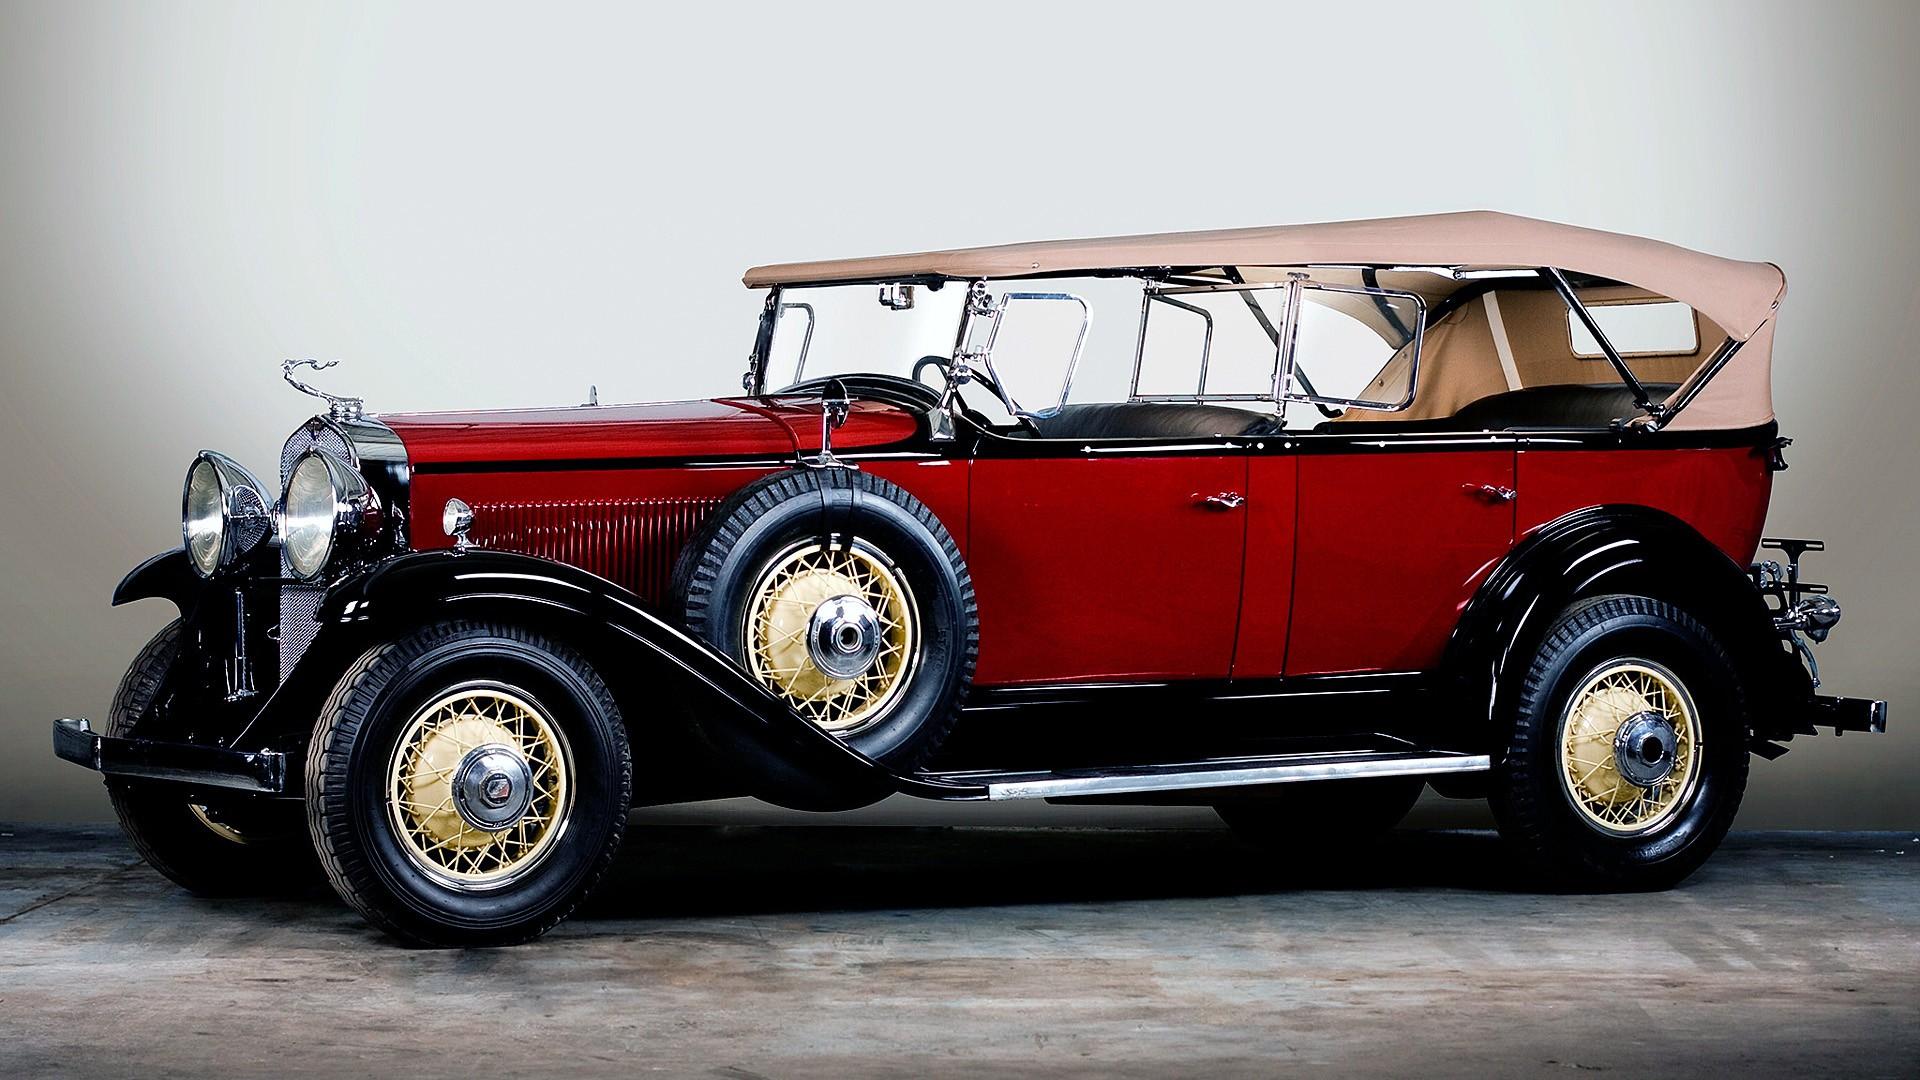 vintage, cars, classic cars - Free Wallpaper / WallpaperJam.com